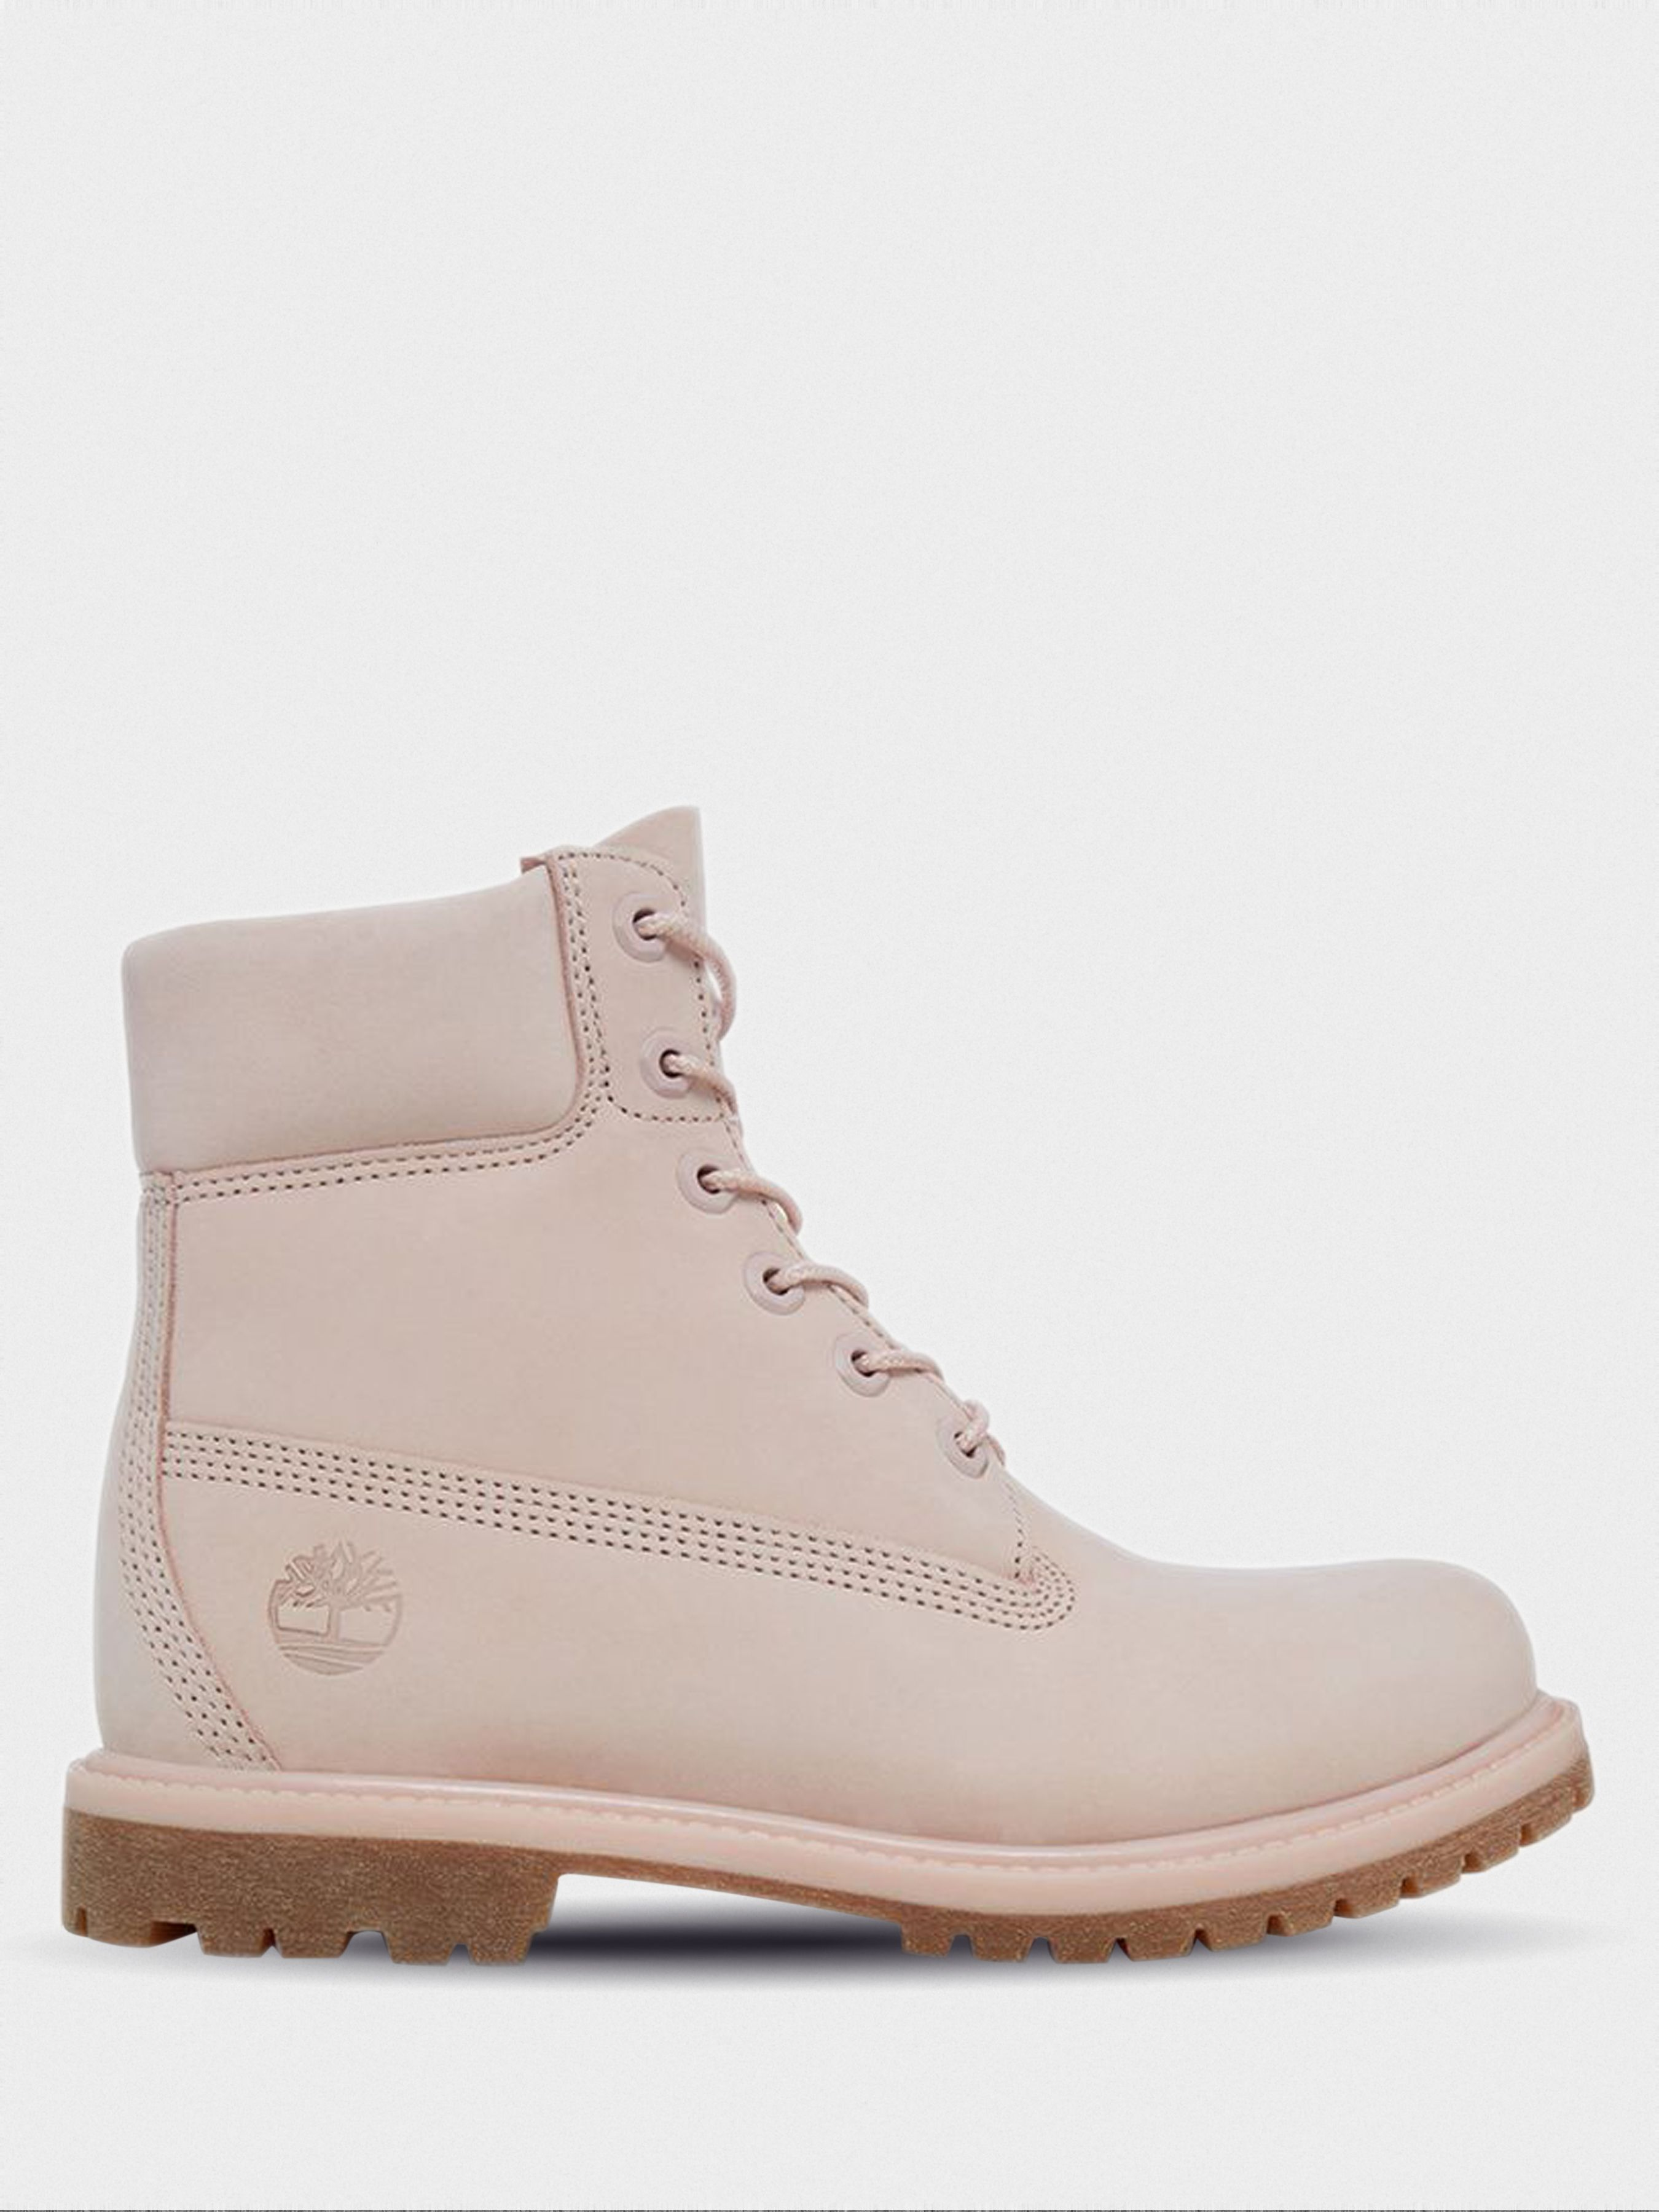 87076103ccba Ботинки для женщин Timberland 6